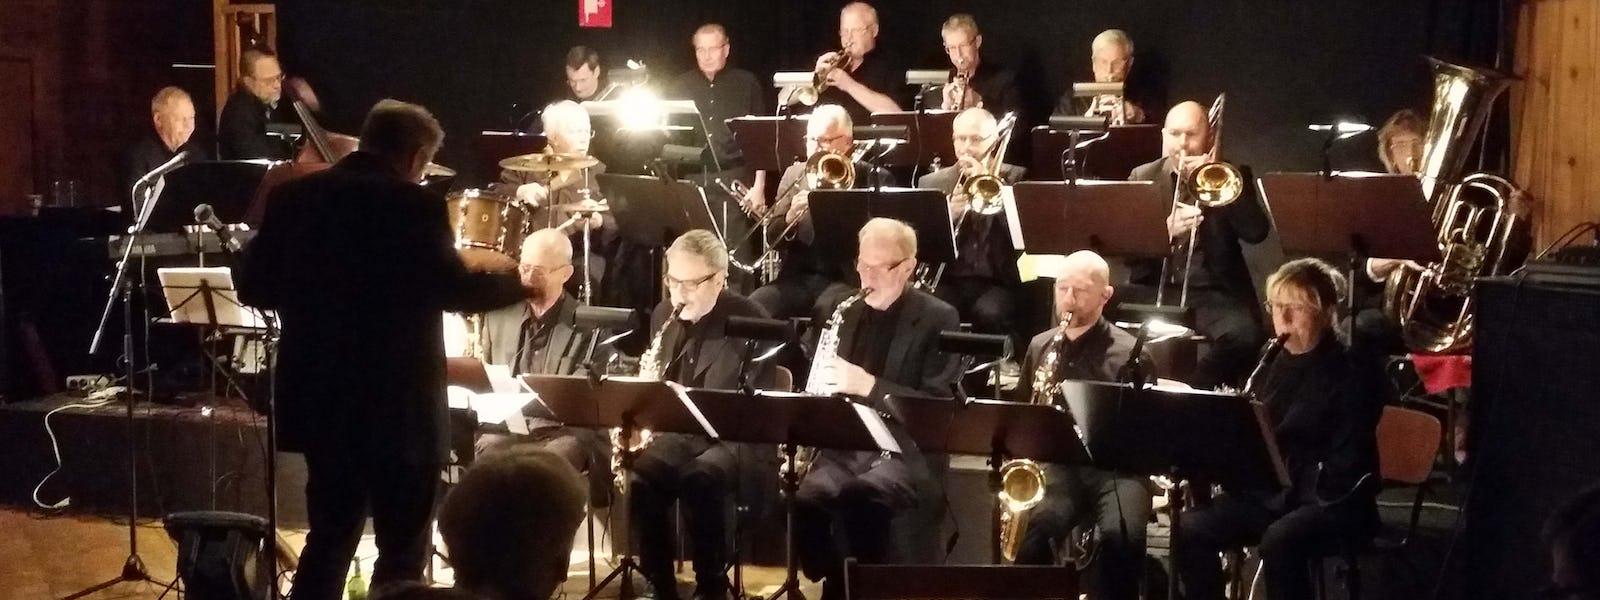 Bild - Big Band Swing